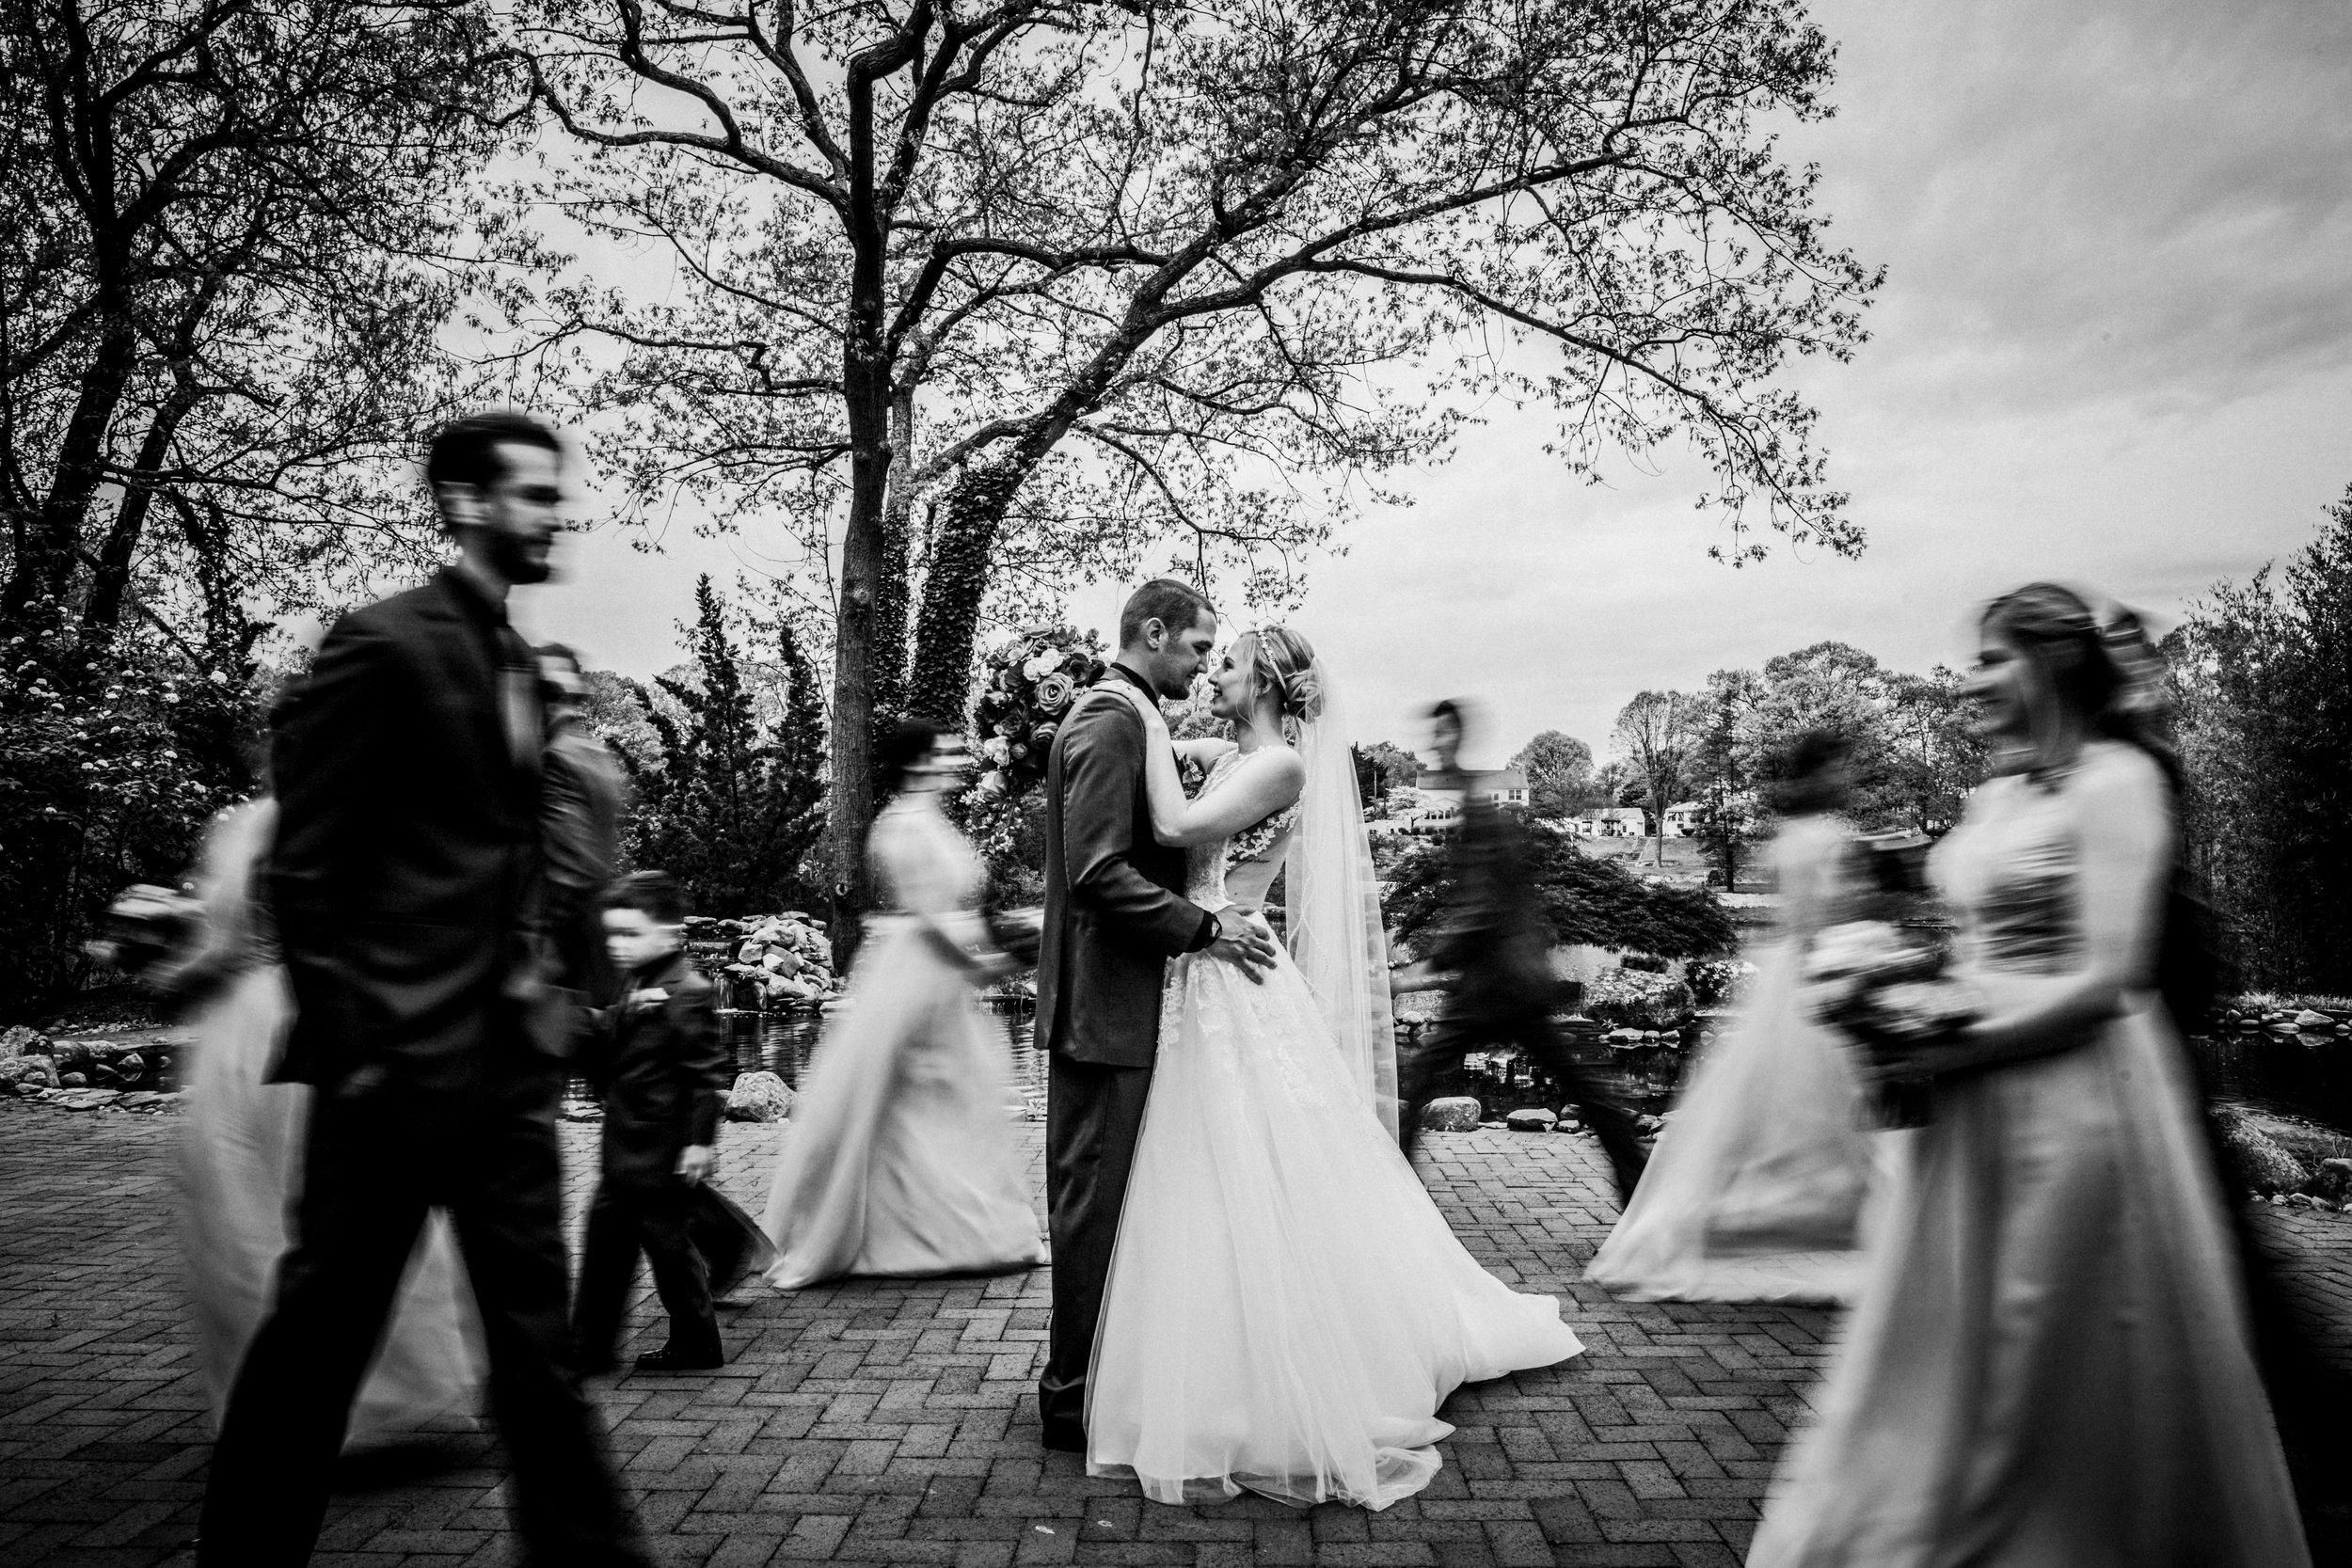 New-Jersey-Wedding-Photographer-Megan&Nick-BridalPartyBW-5.jpg